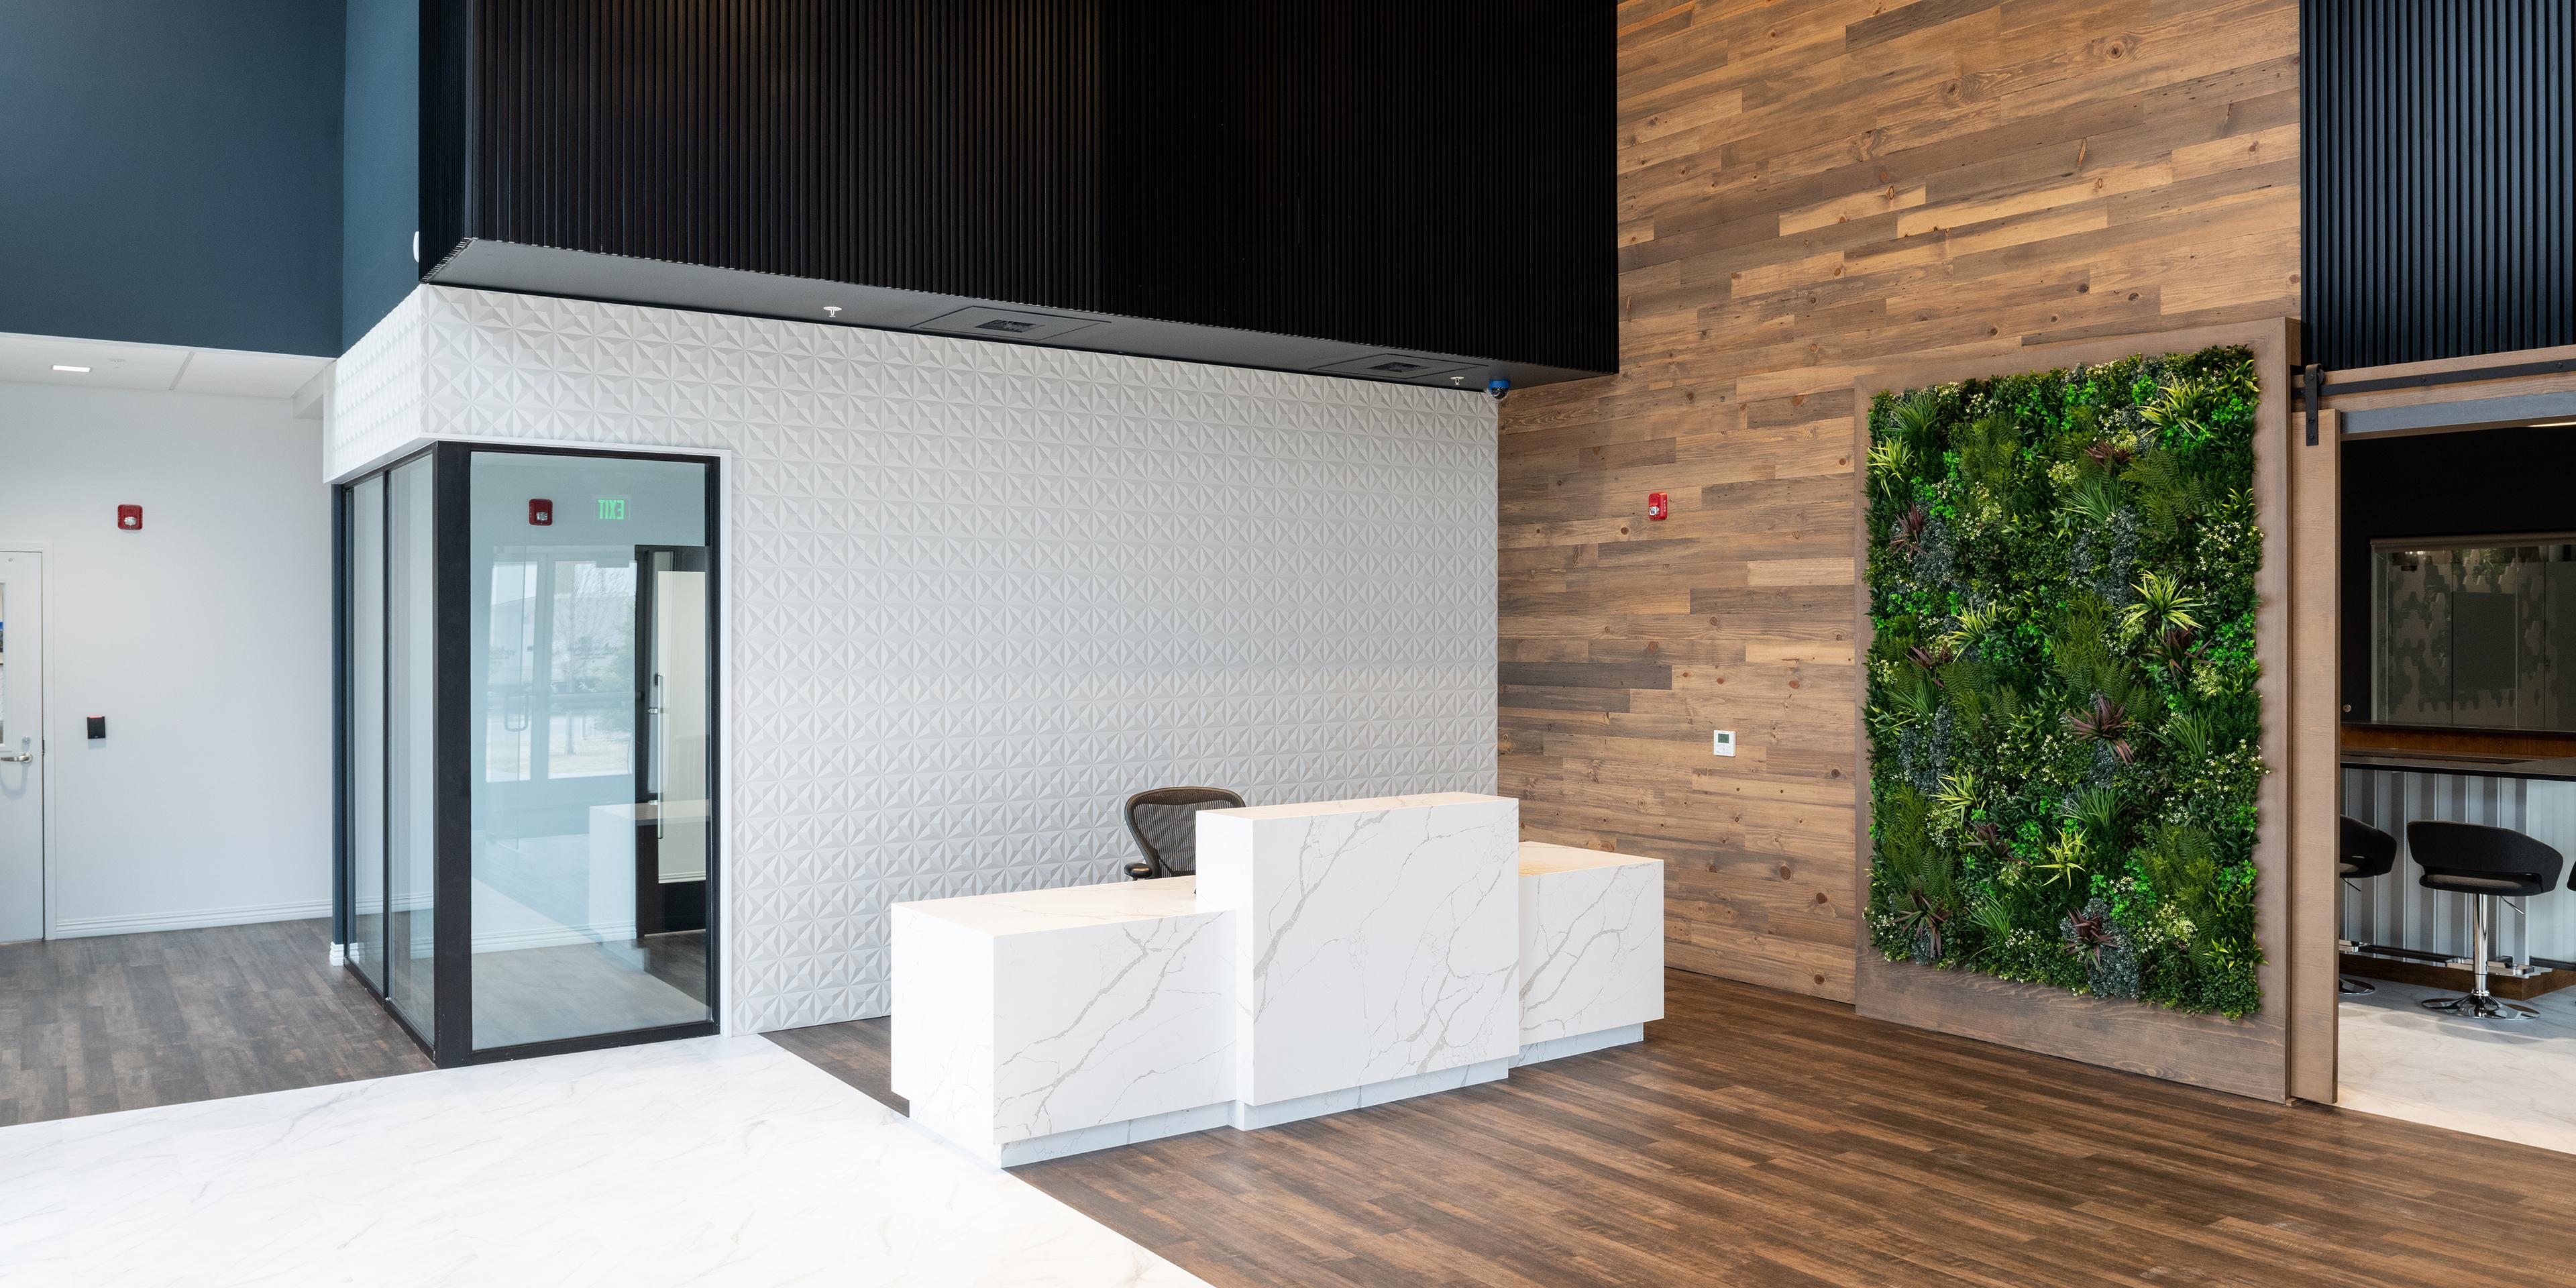 MycoTechnology Plant-based protein facility lobby